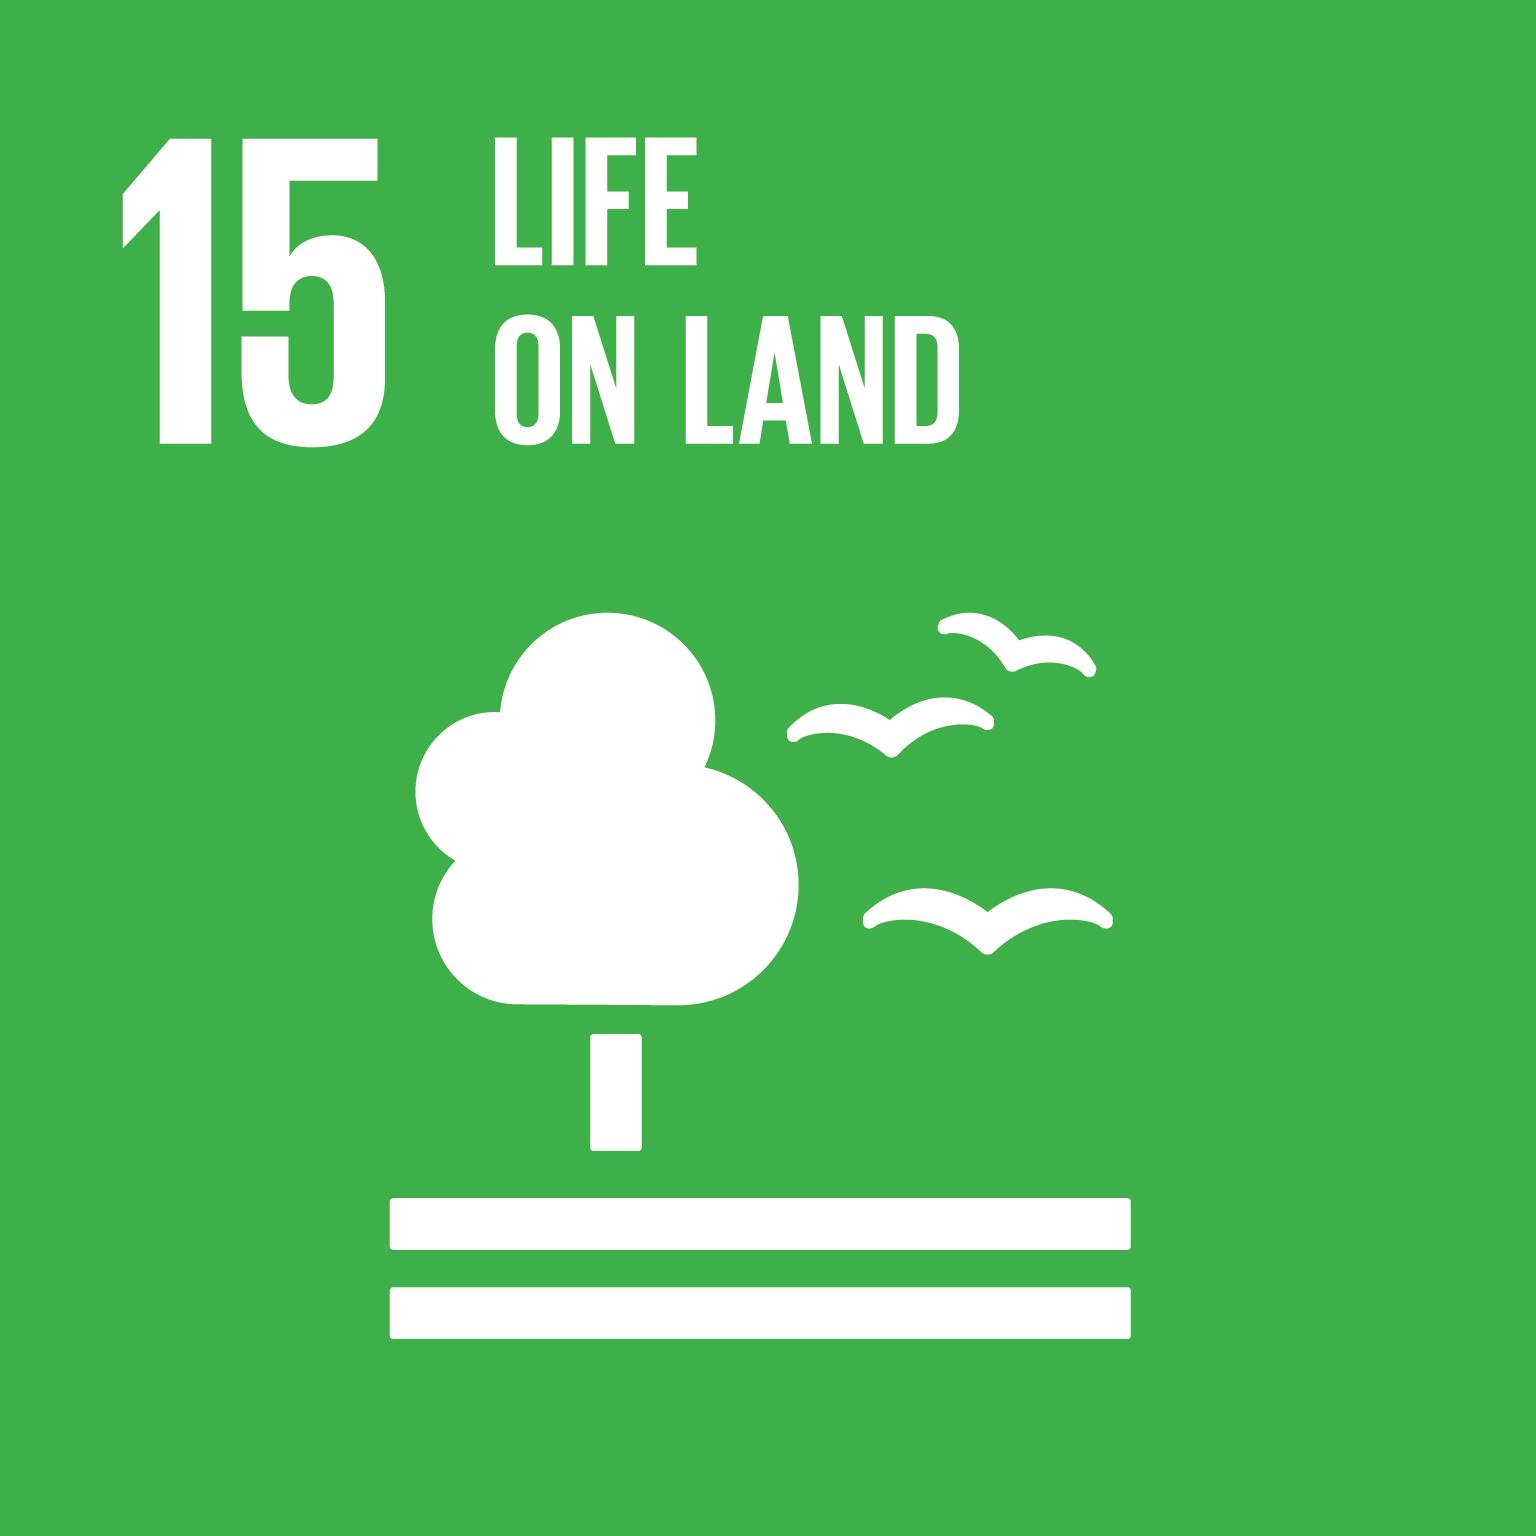 SDG Goal 15 'Life on land' © UN